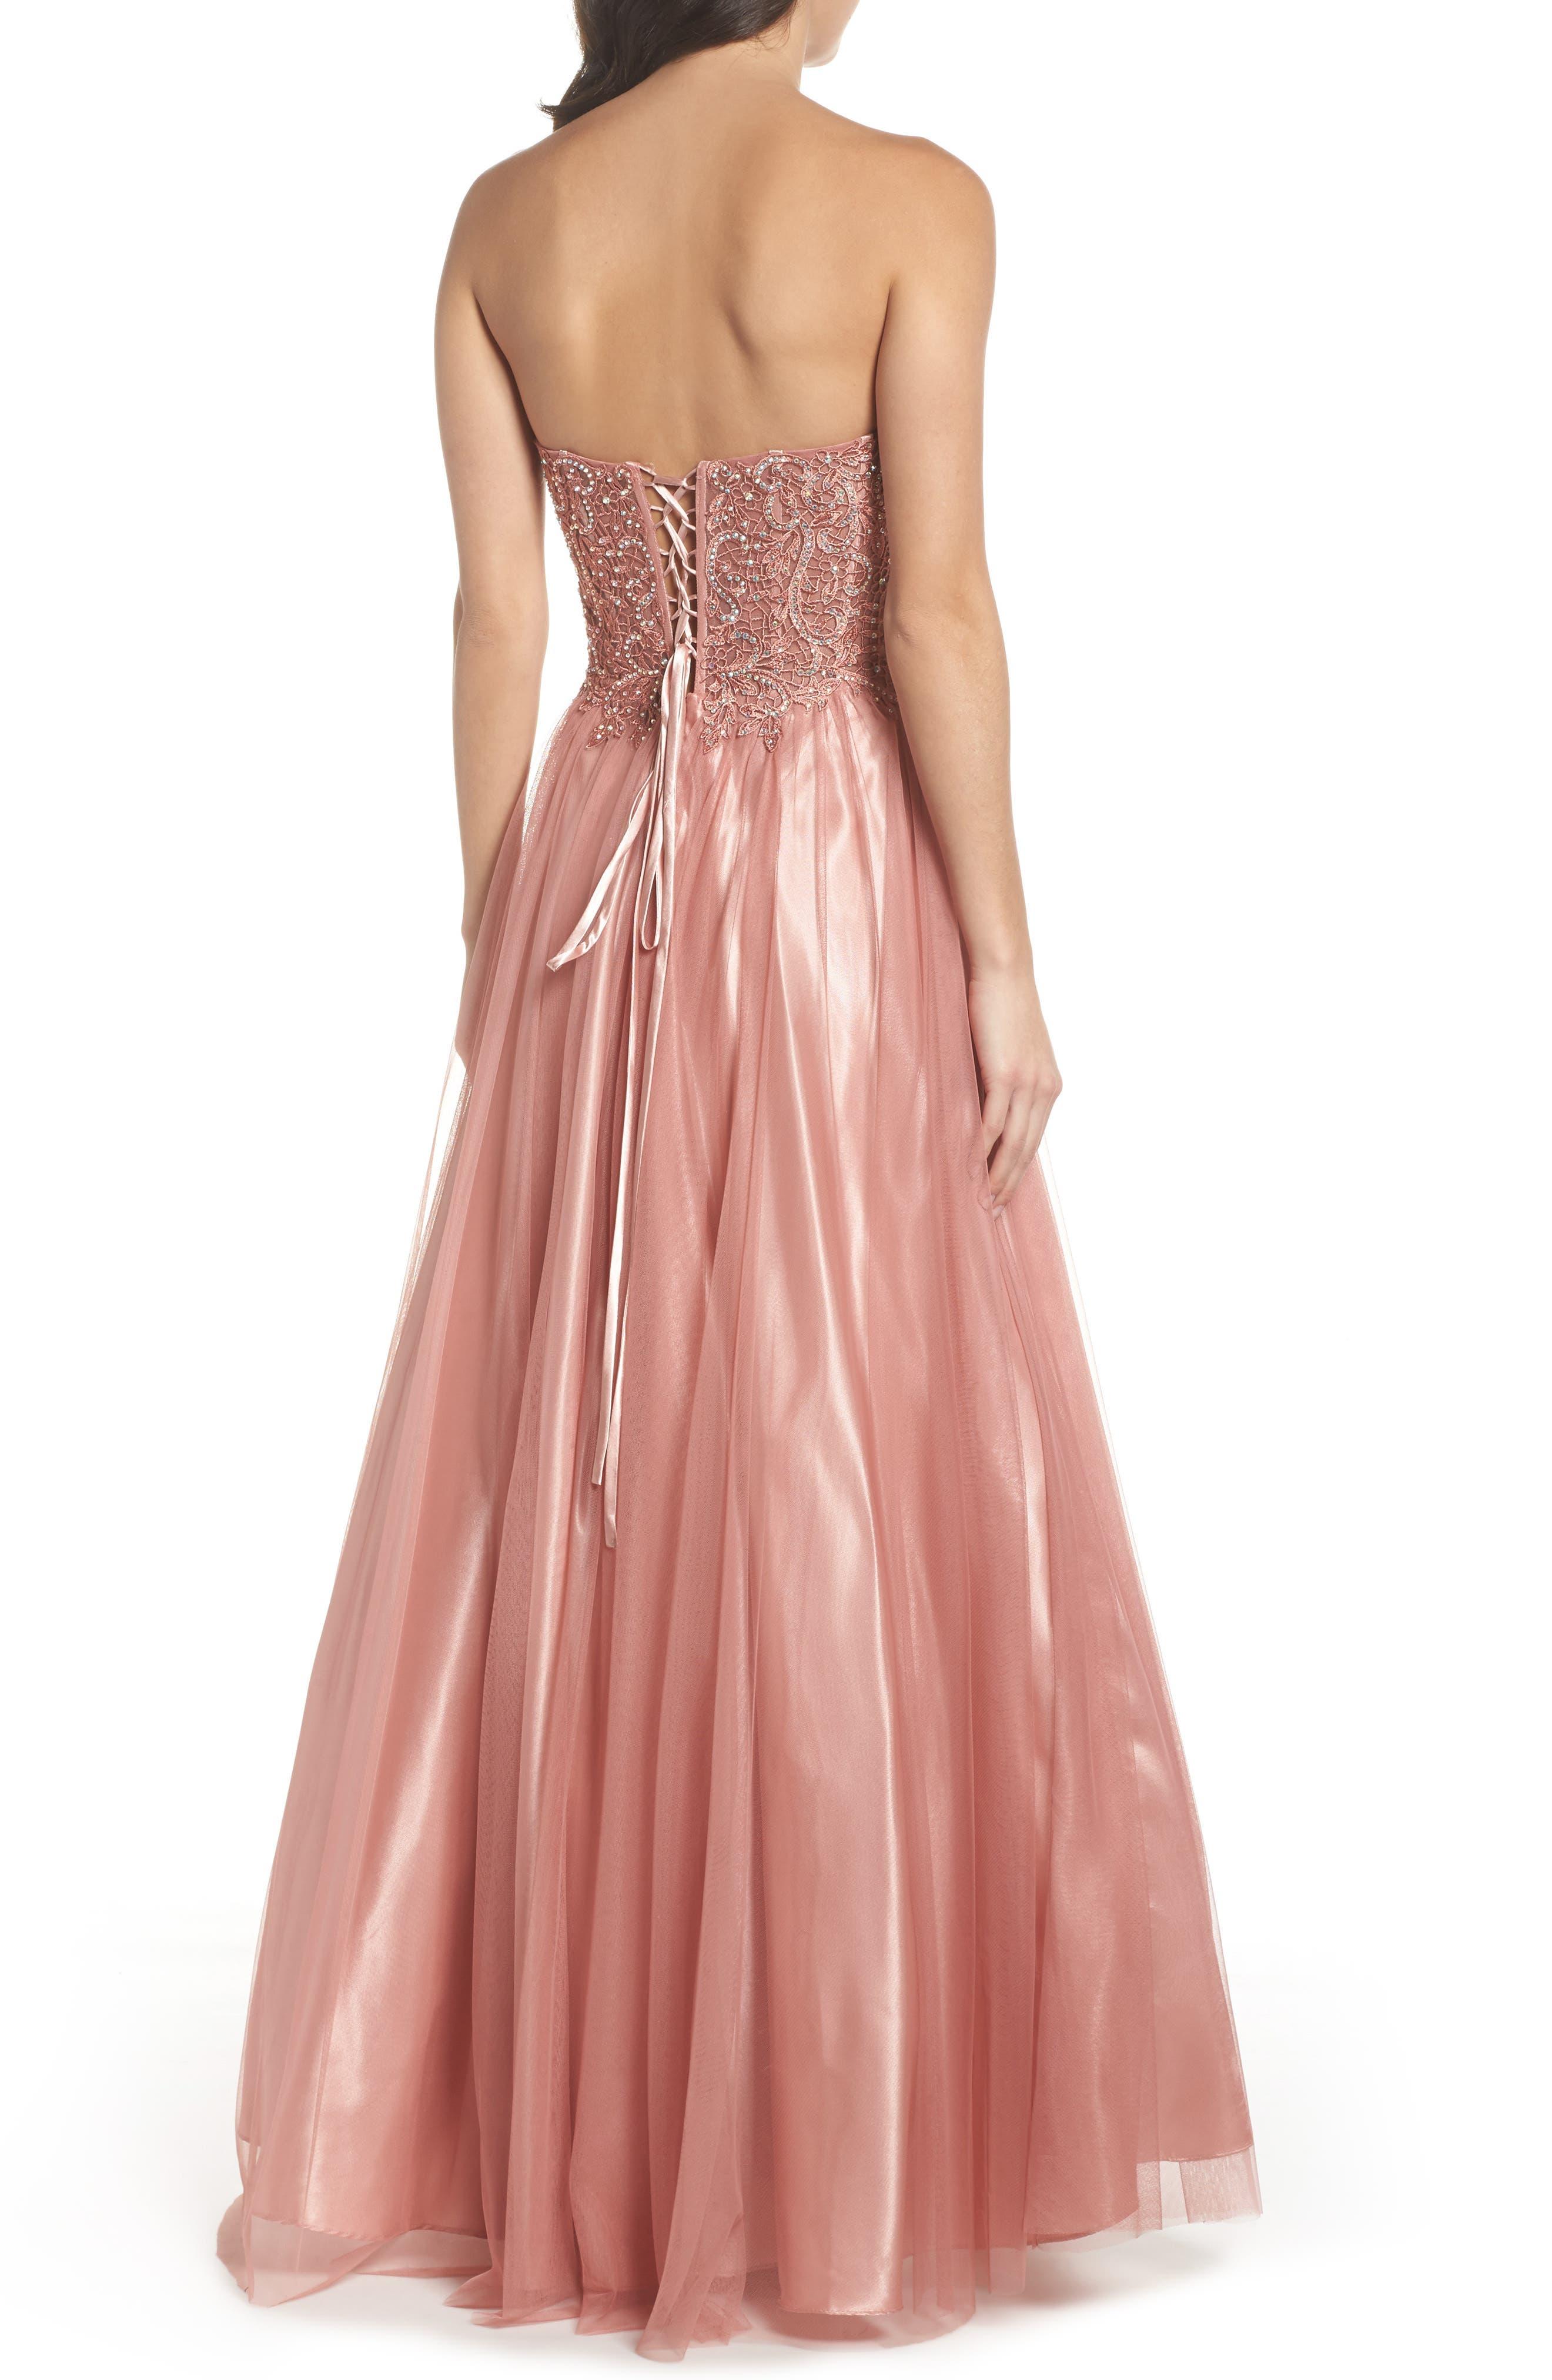 Embellished Corset Ballgown,                             Alternate thumbnail 2, color,                             Rose